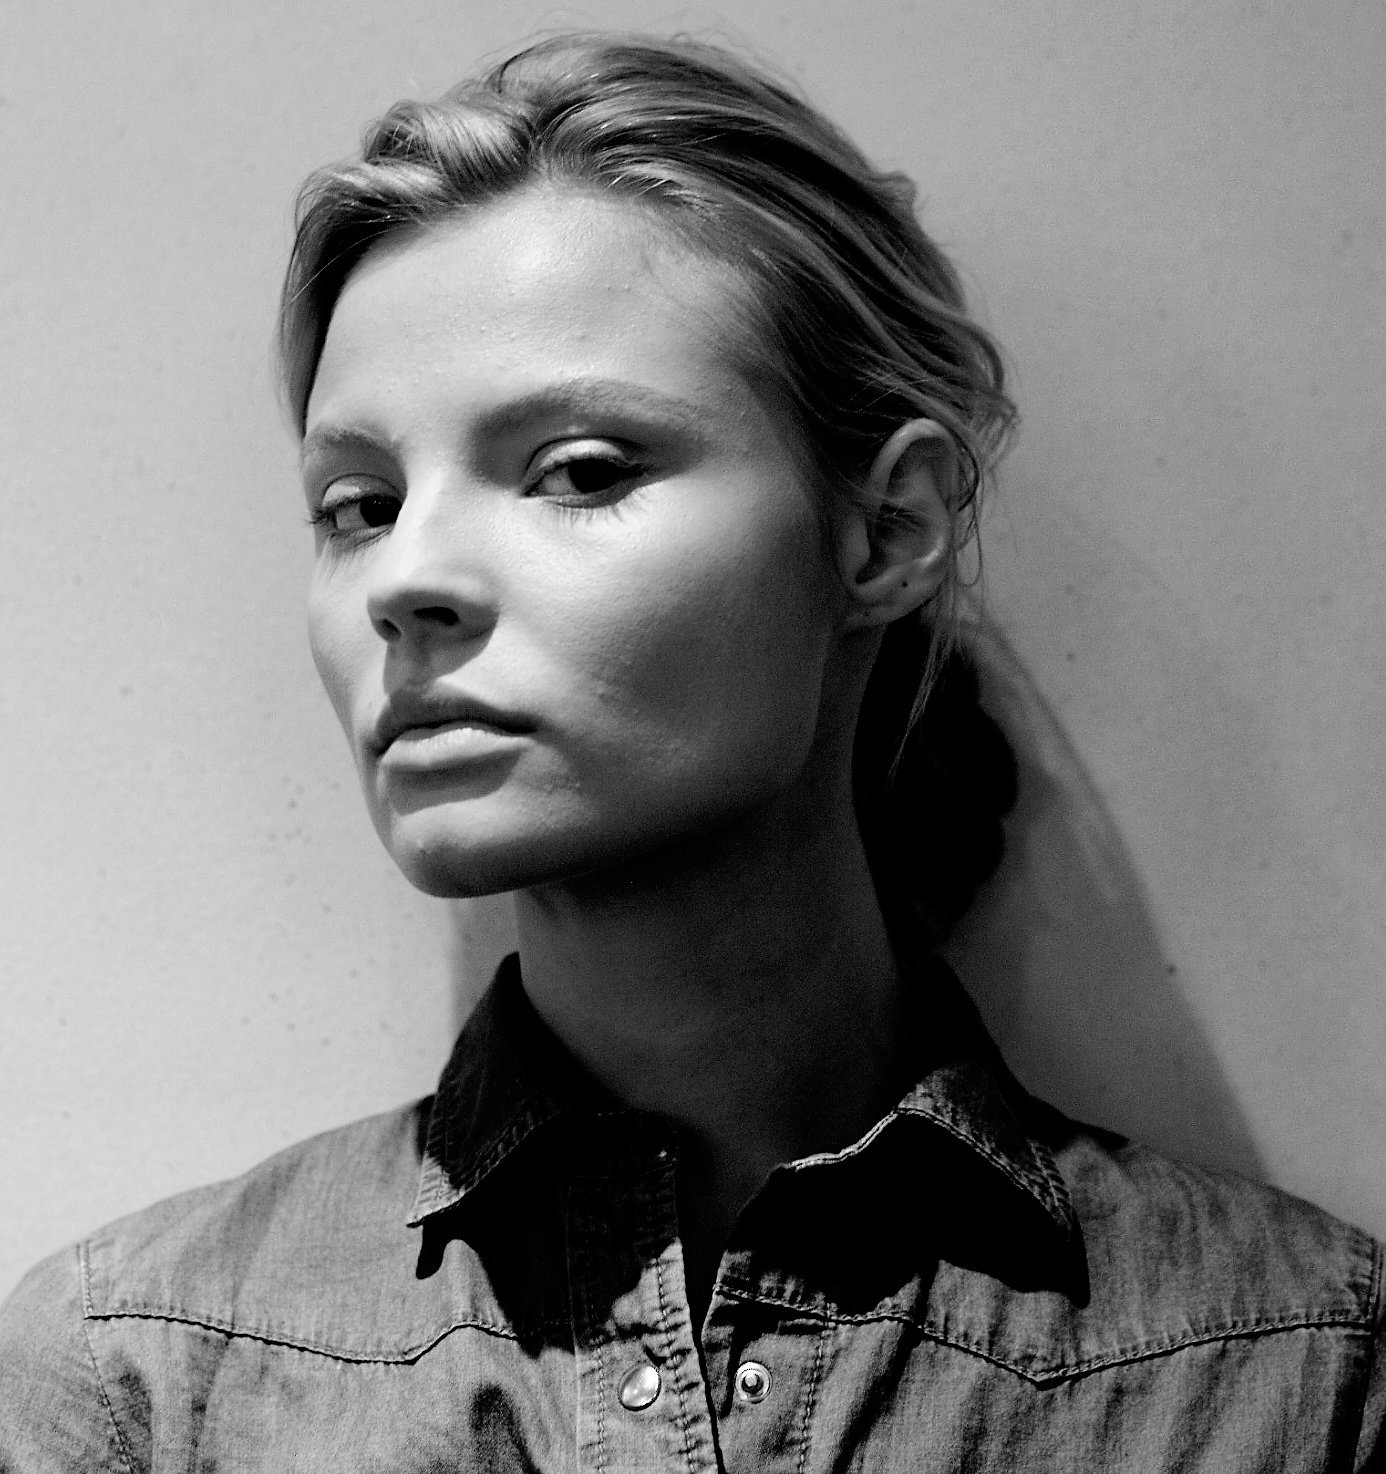 Magdalena Frackwiak